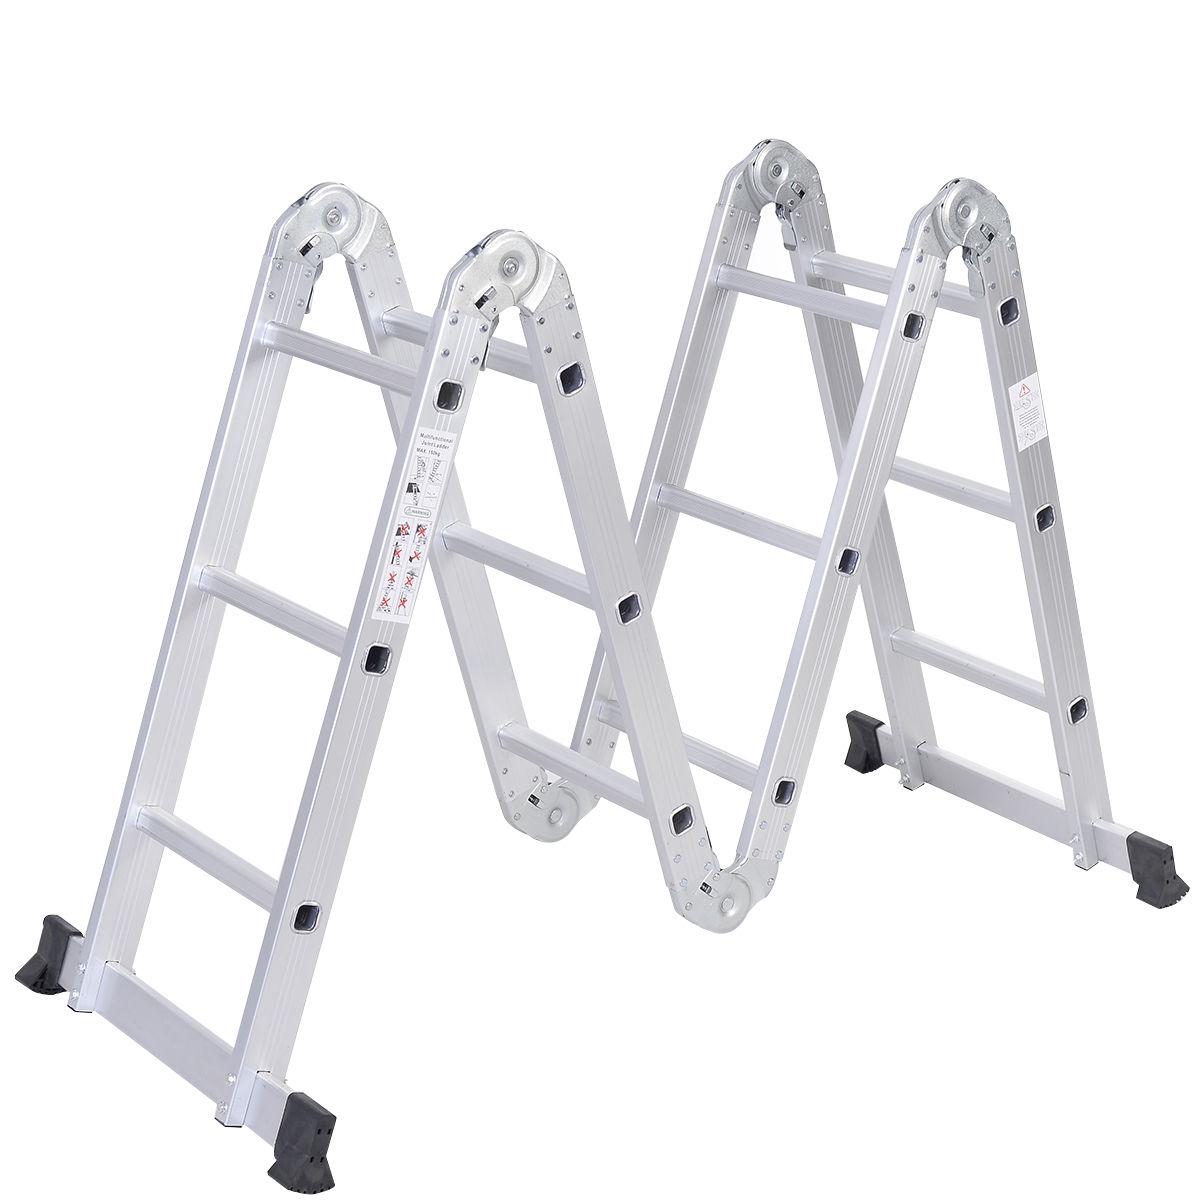 12 Foot Aluminum Step Ladders : Ft multi purpose aluminum folding step ladder scaffold